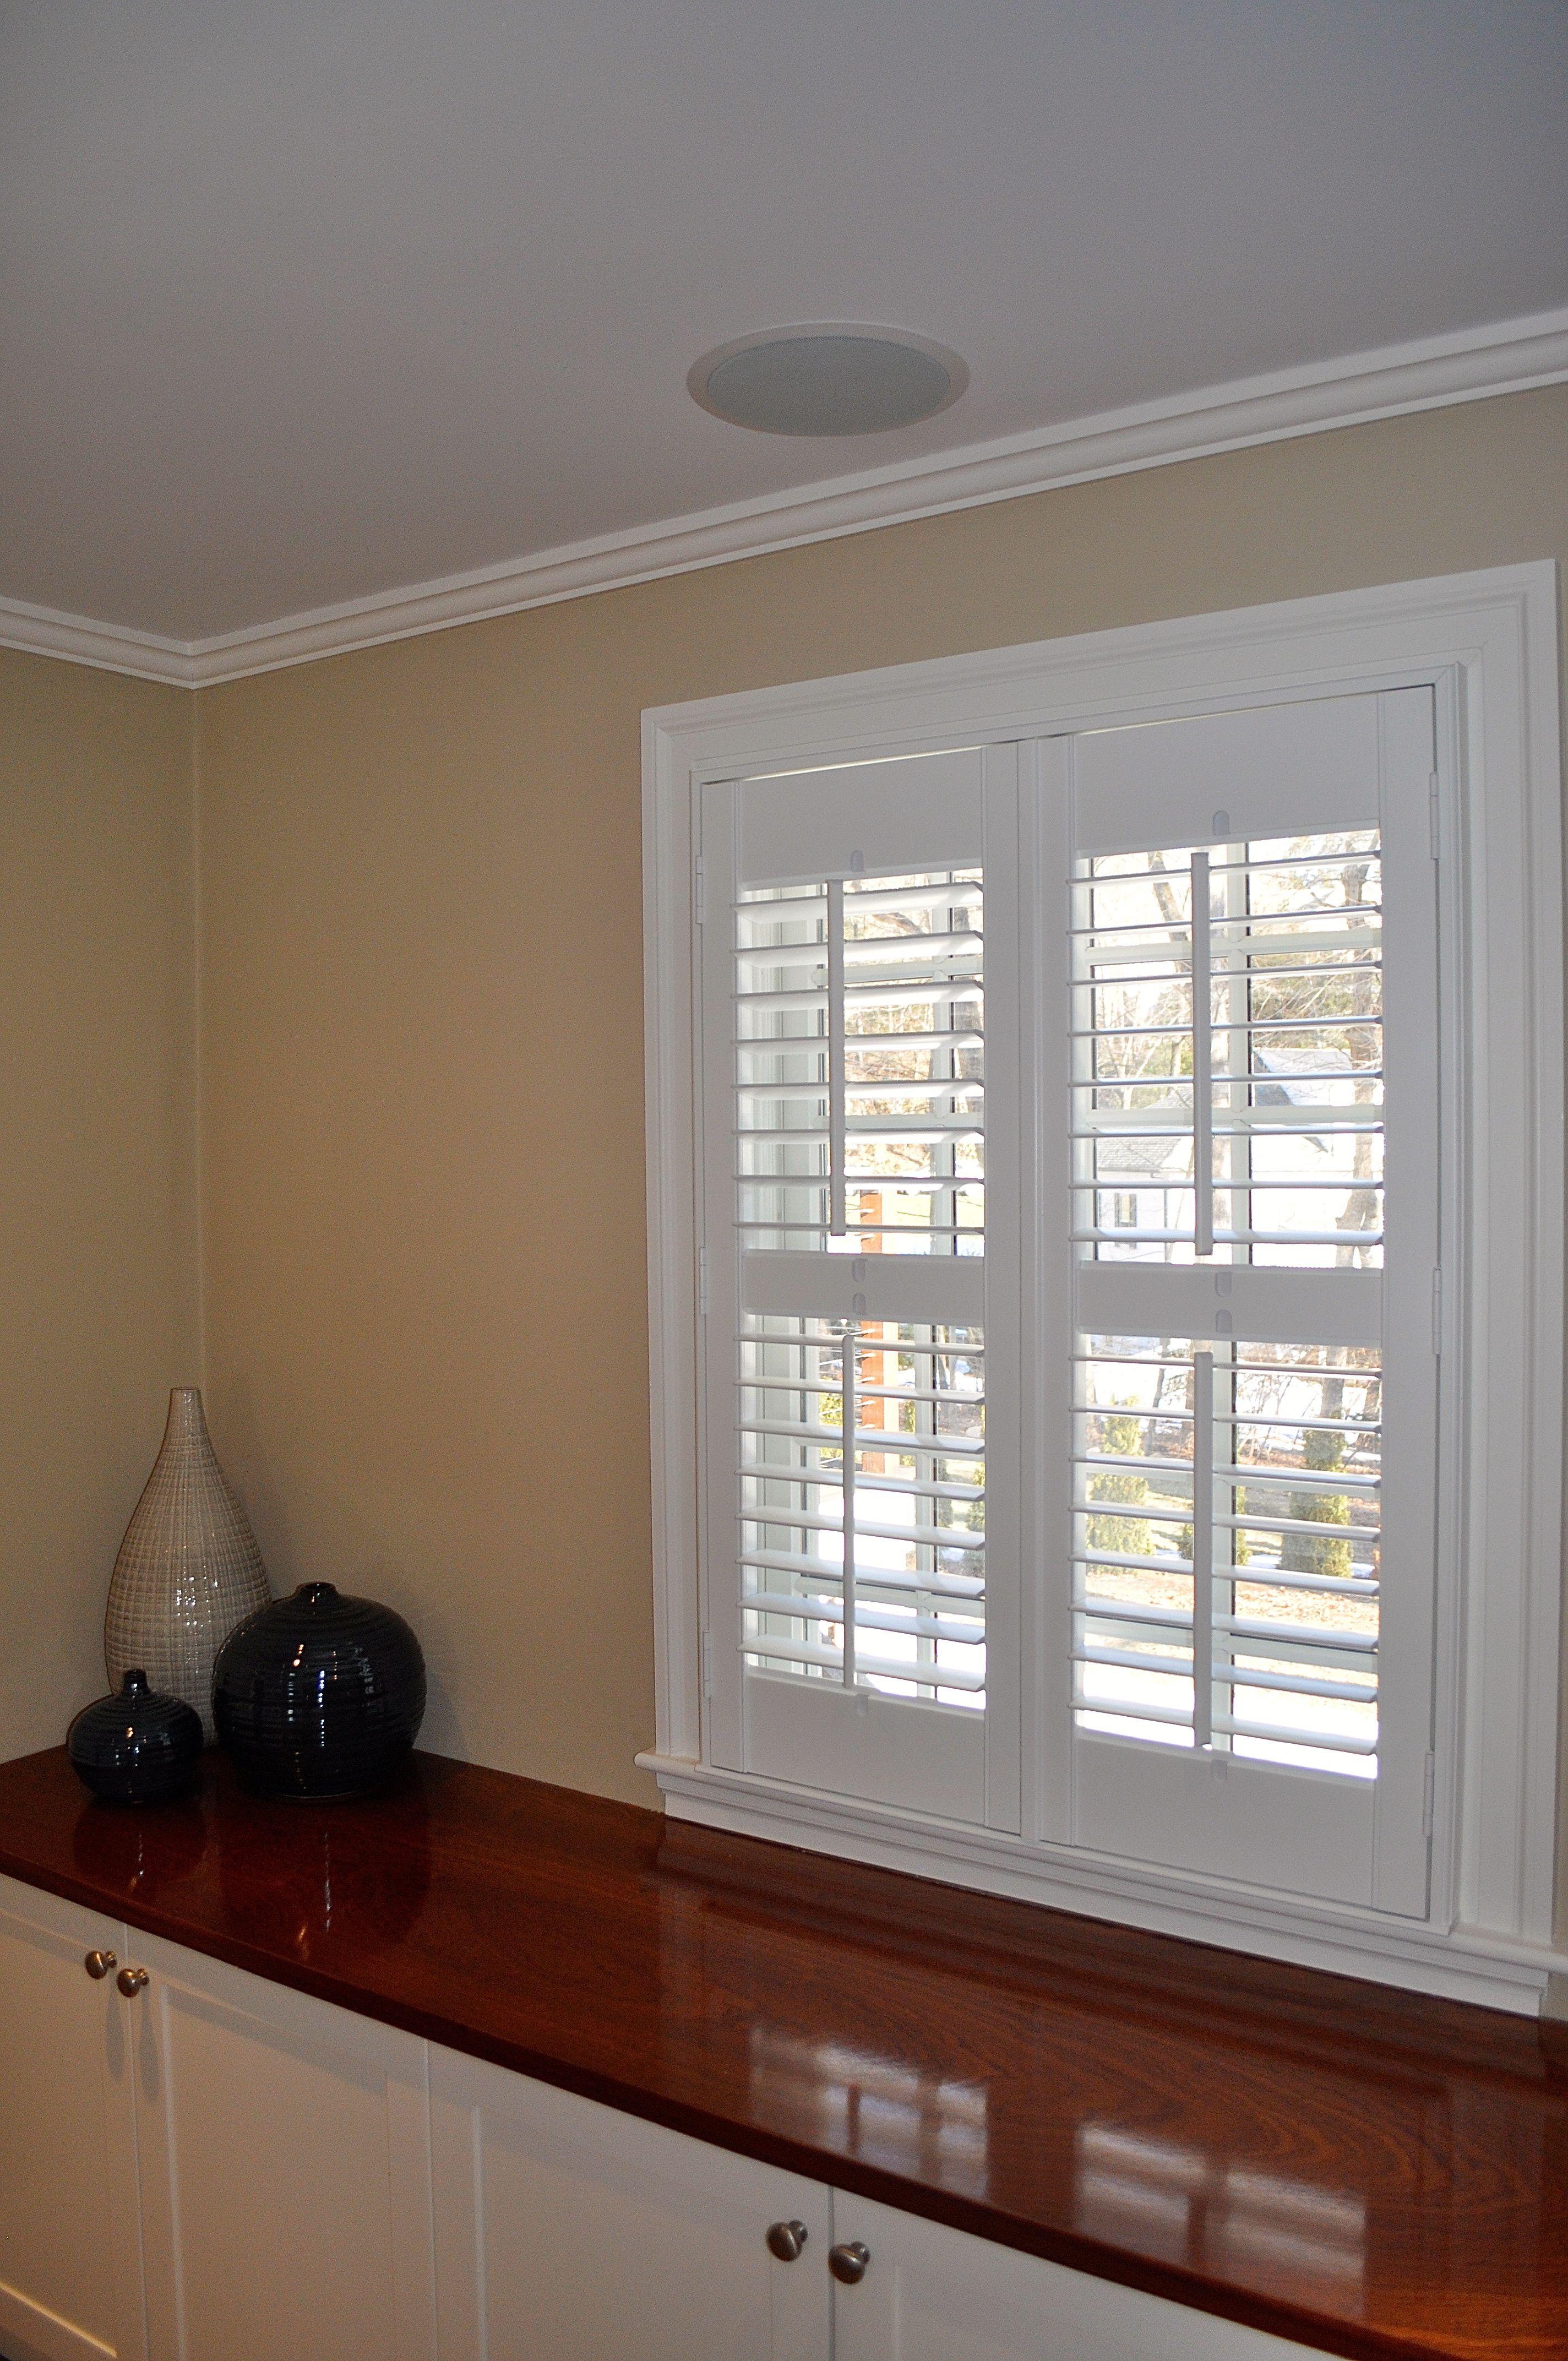 interior panel solid wooden exterior panelssolid pair pine shutters internal for extira image composite result windowssolid w shutter window victorian